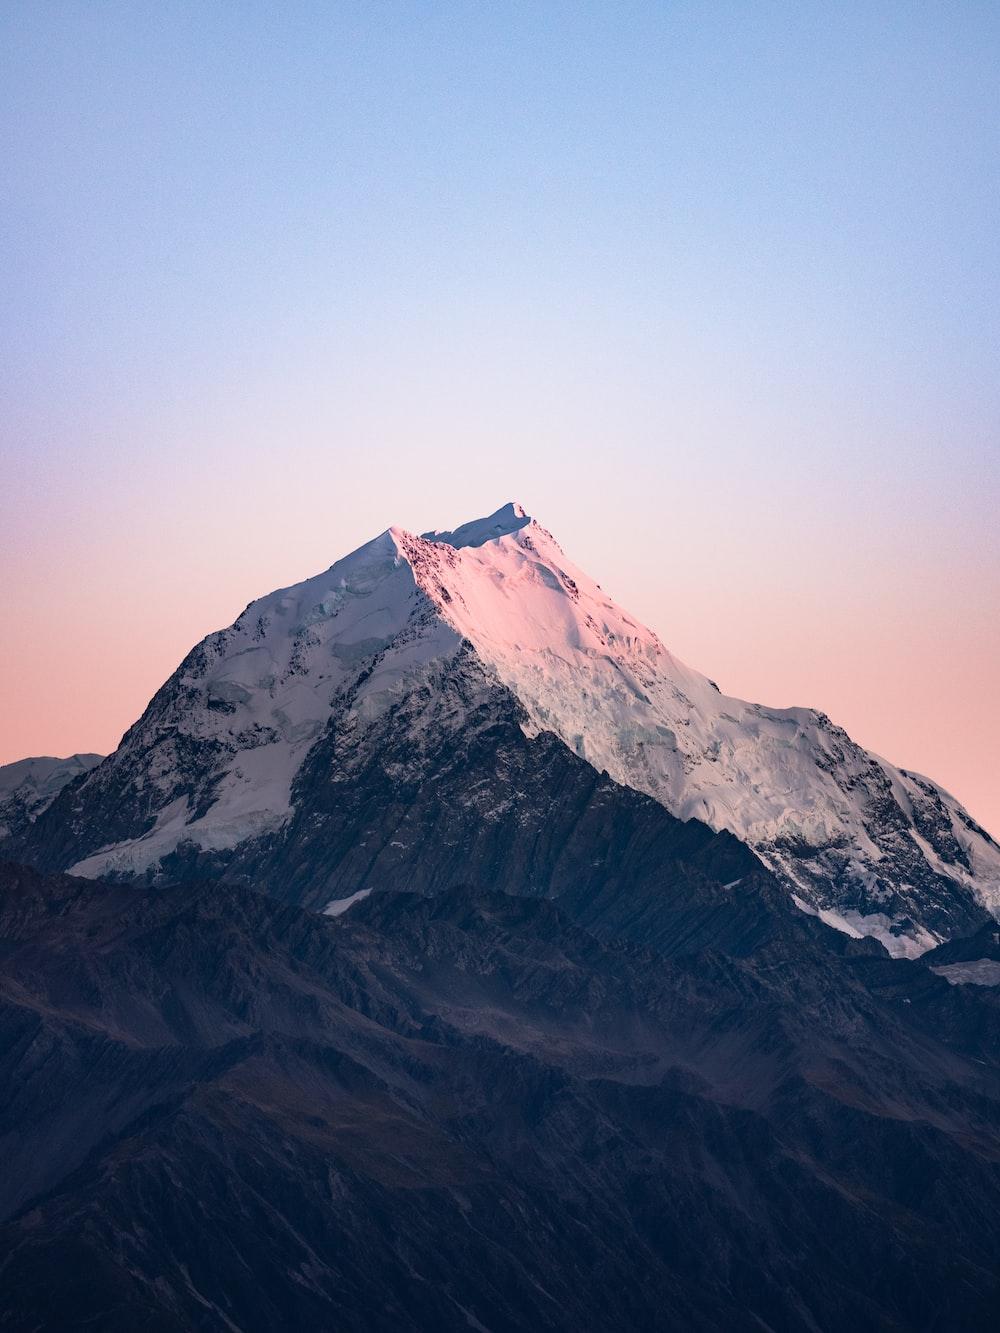 Mountain Wallpapers Free HD Download [12+ HQ]   Unsplash